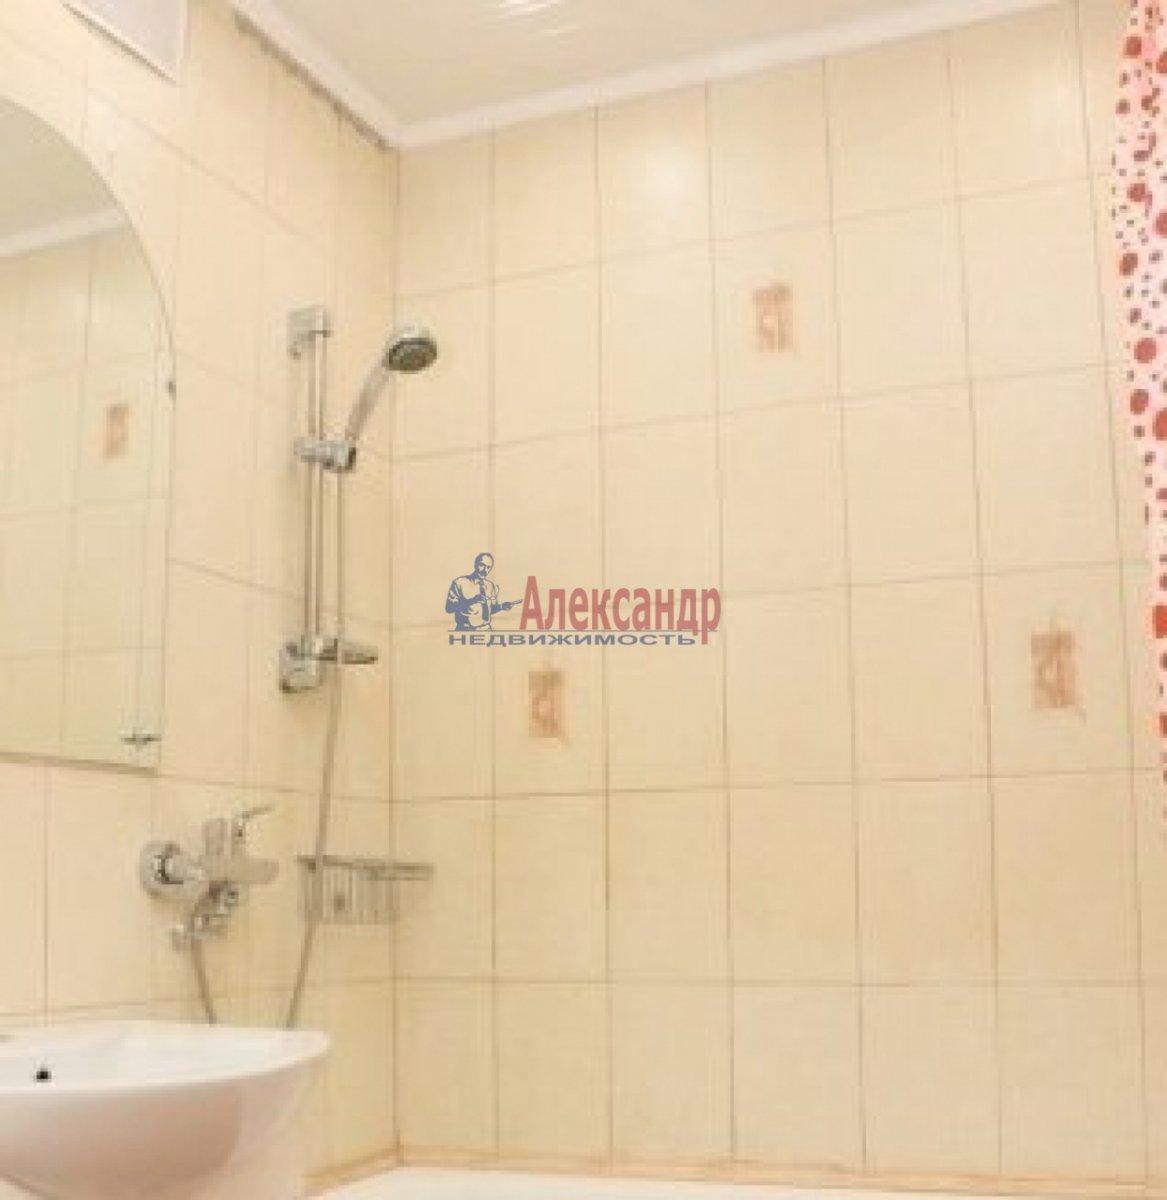 1-комнатная квартира (33м2) в аренду по адресу Олеко Дундича ул., 23— фото 3 из 3